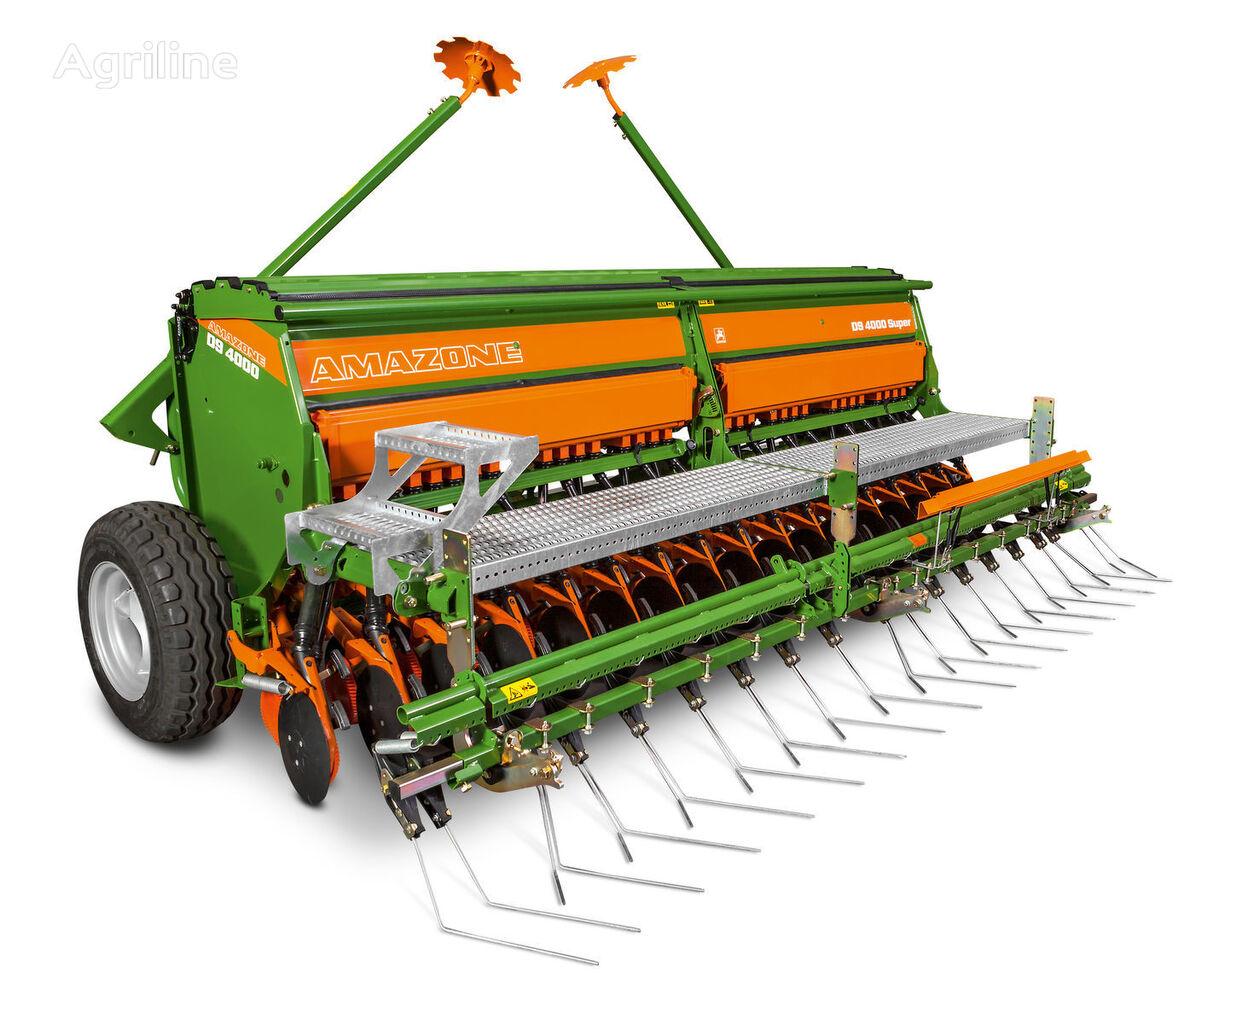 AMAZONE D9 4000, Akciya!!! sembradora mecánica nueva